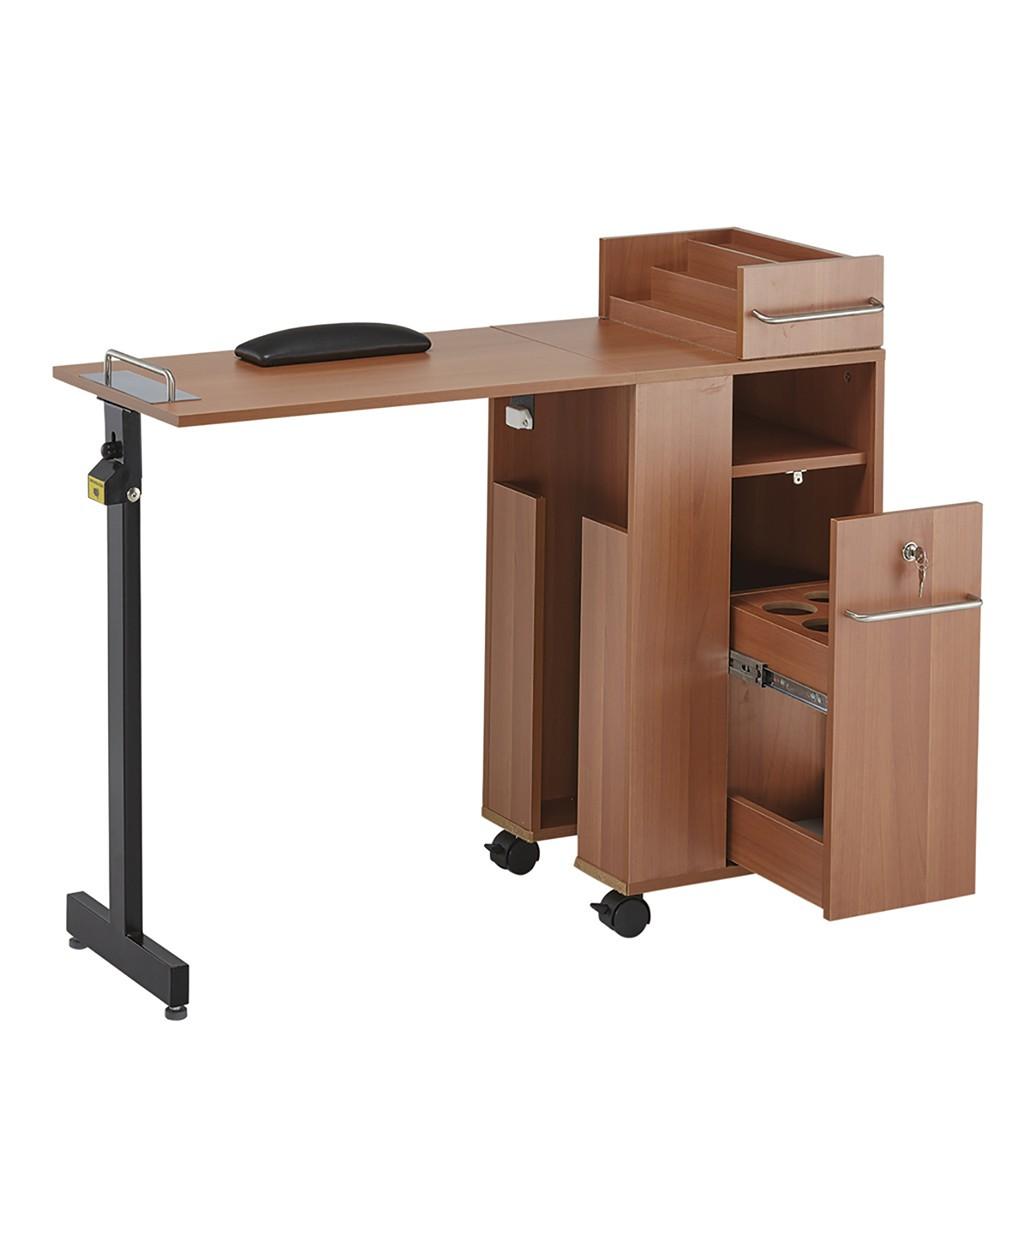 Manicure Table For Sale >> Manicure Tables Modern Salon Nail Tables Desks Stations